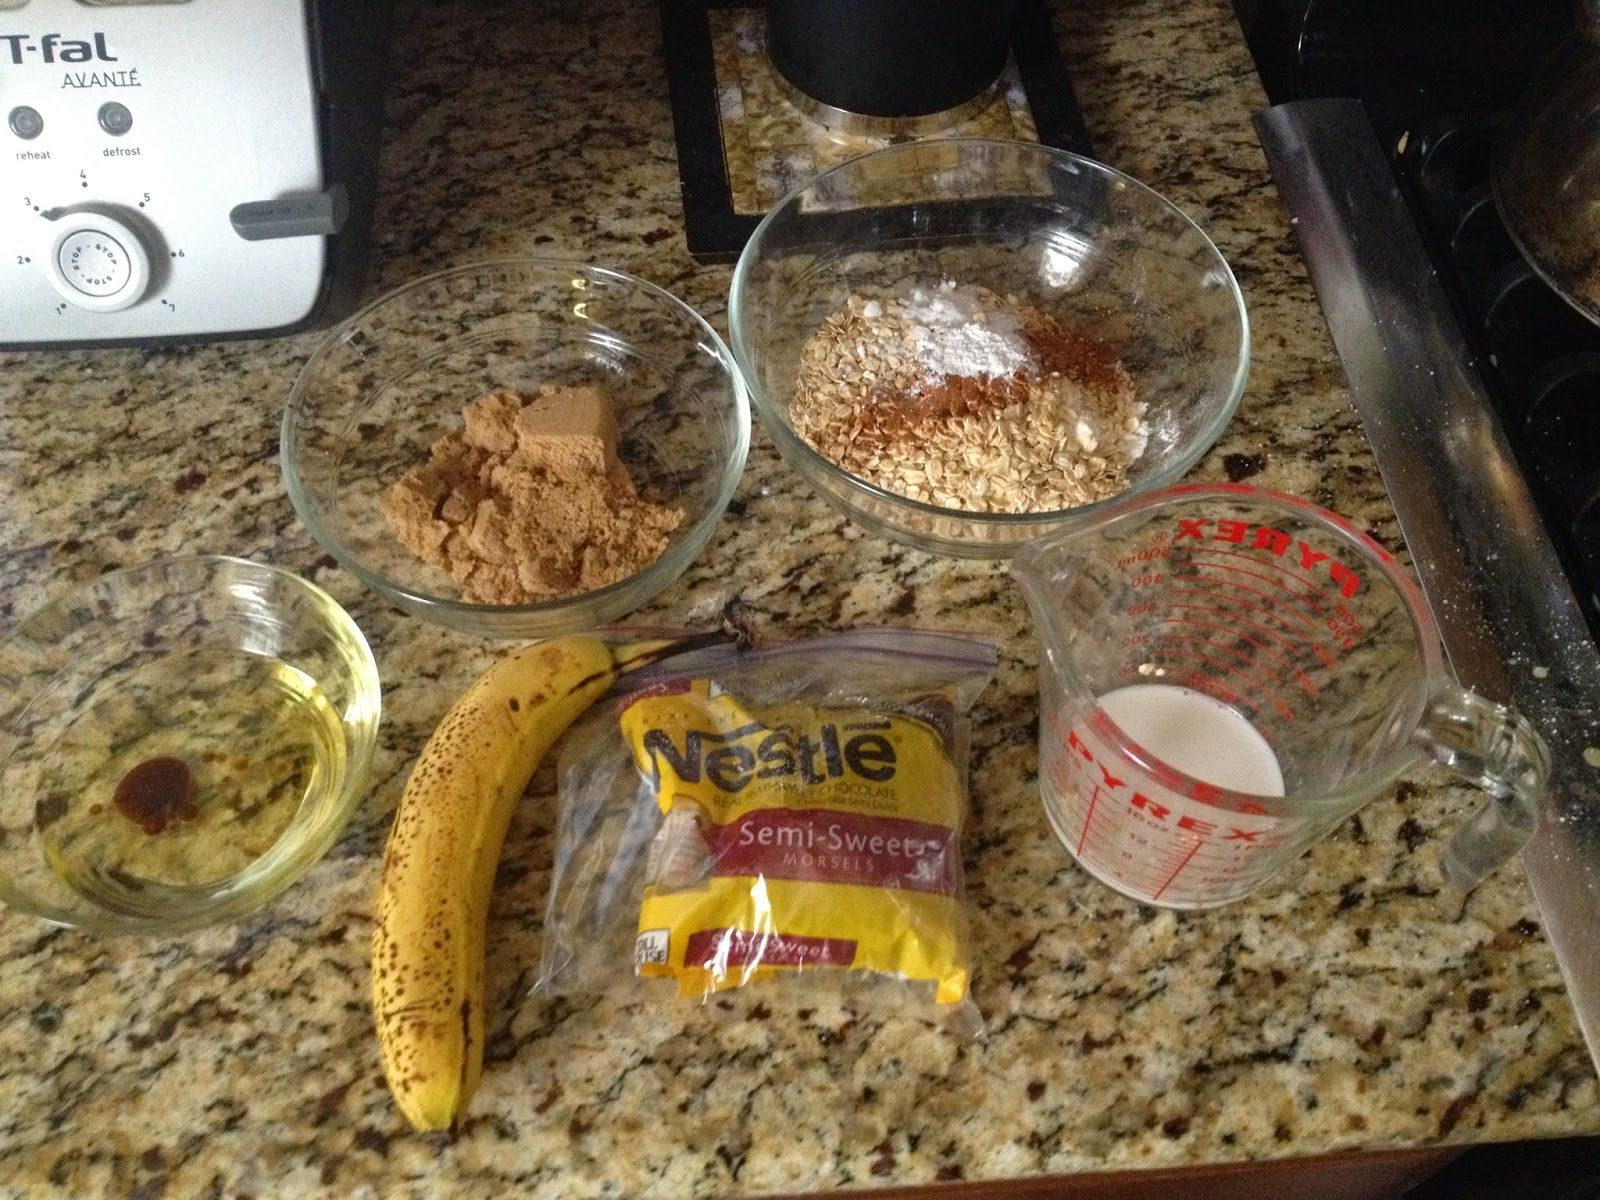 KLASSY KALIFORNIAN   Let's Make Some Cookies! http://klassykalifornian.blogspot.com/2014/09/healthy-oatmeal-chocolate-chip-cookies.html